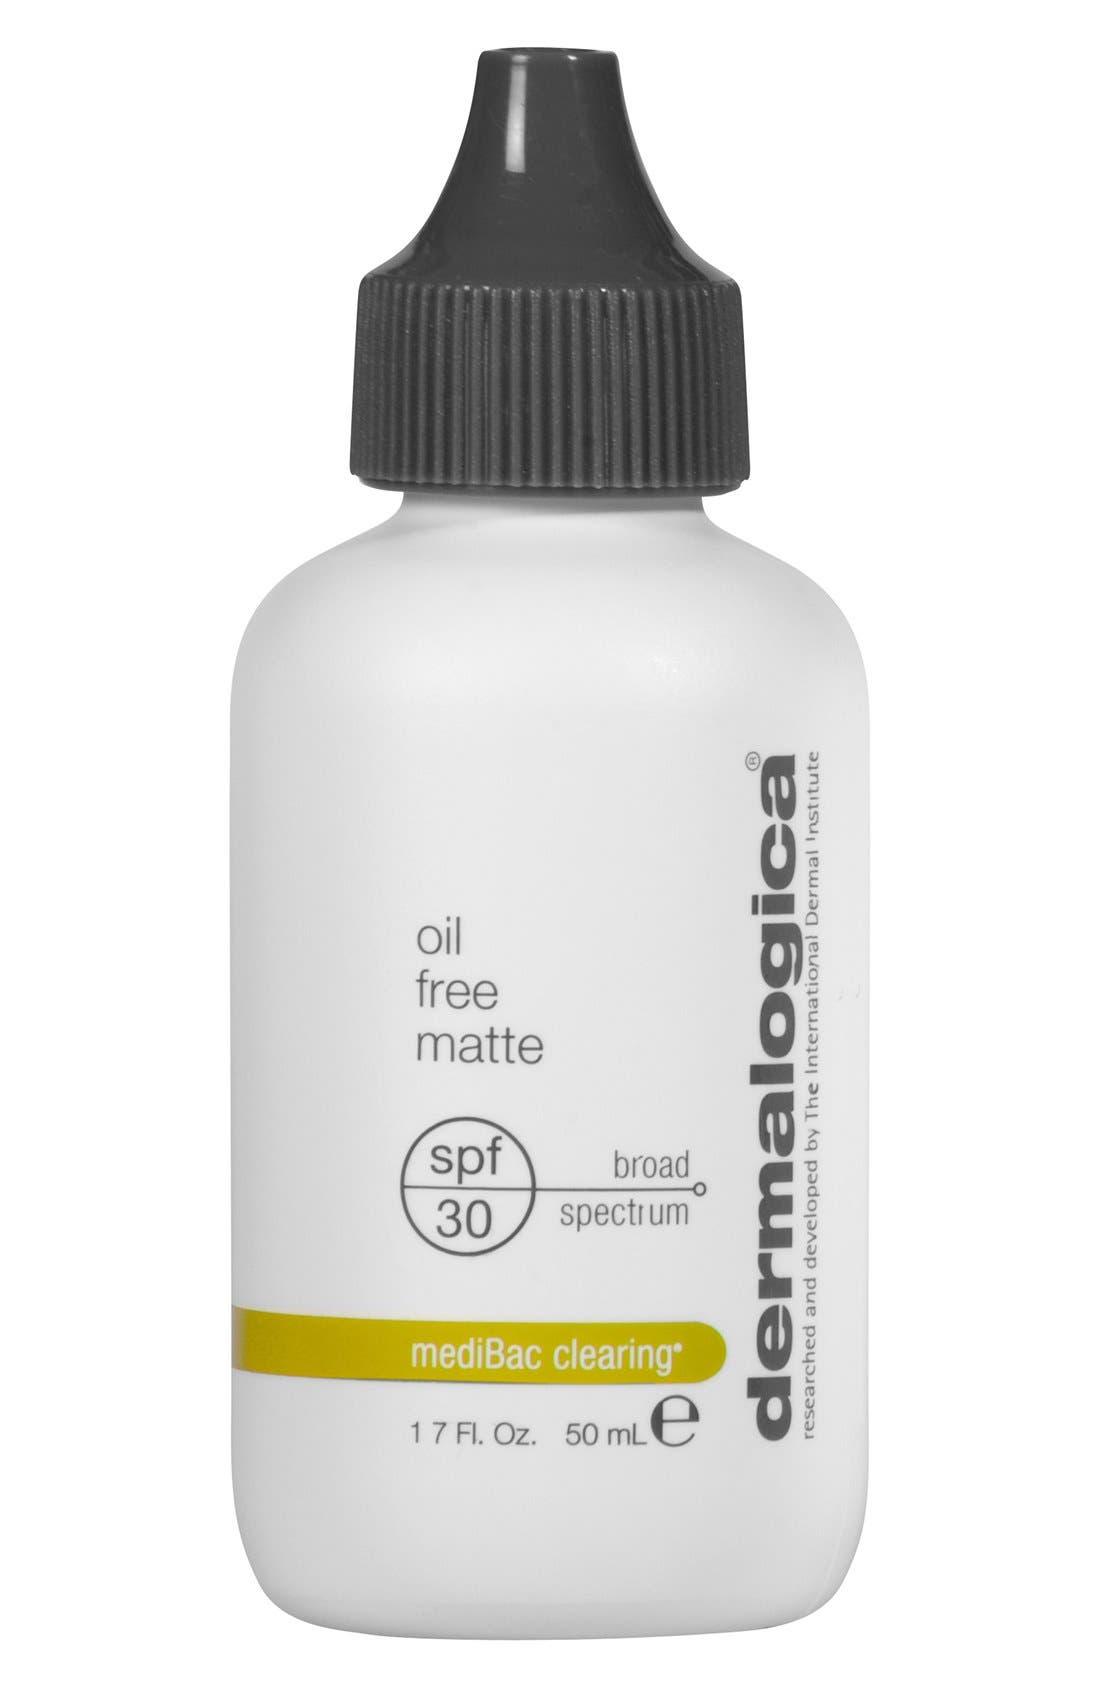 dermalogica® Oil Free Matte SPF 30